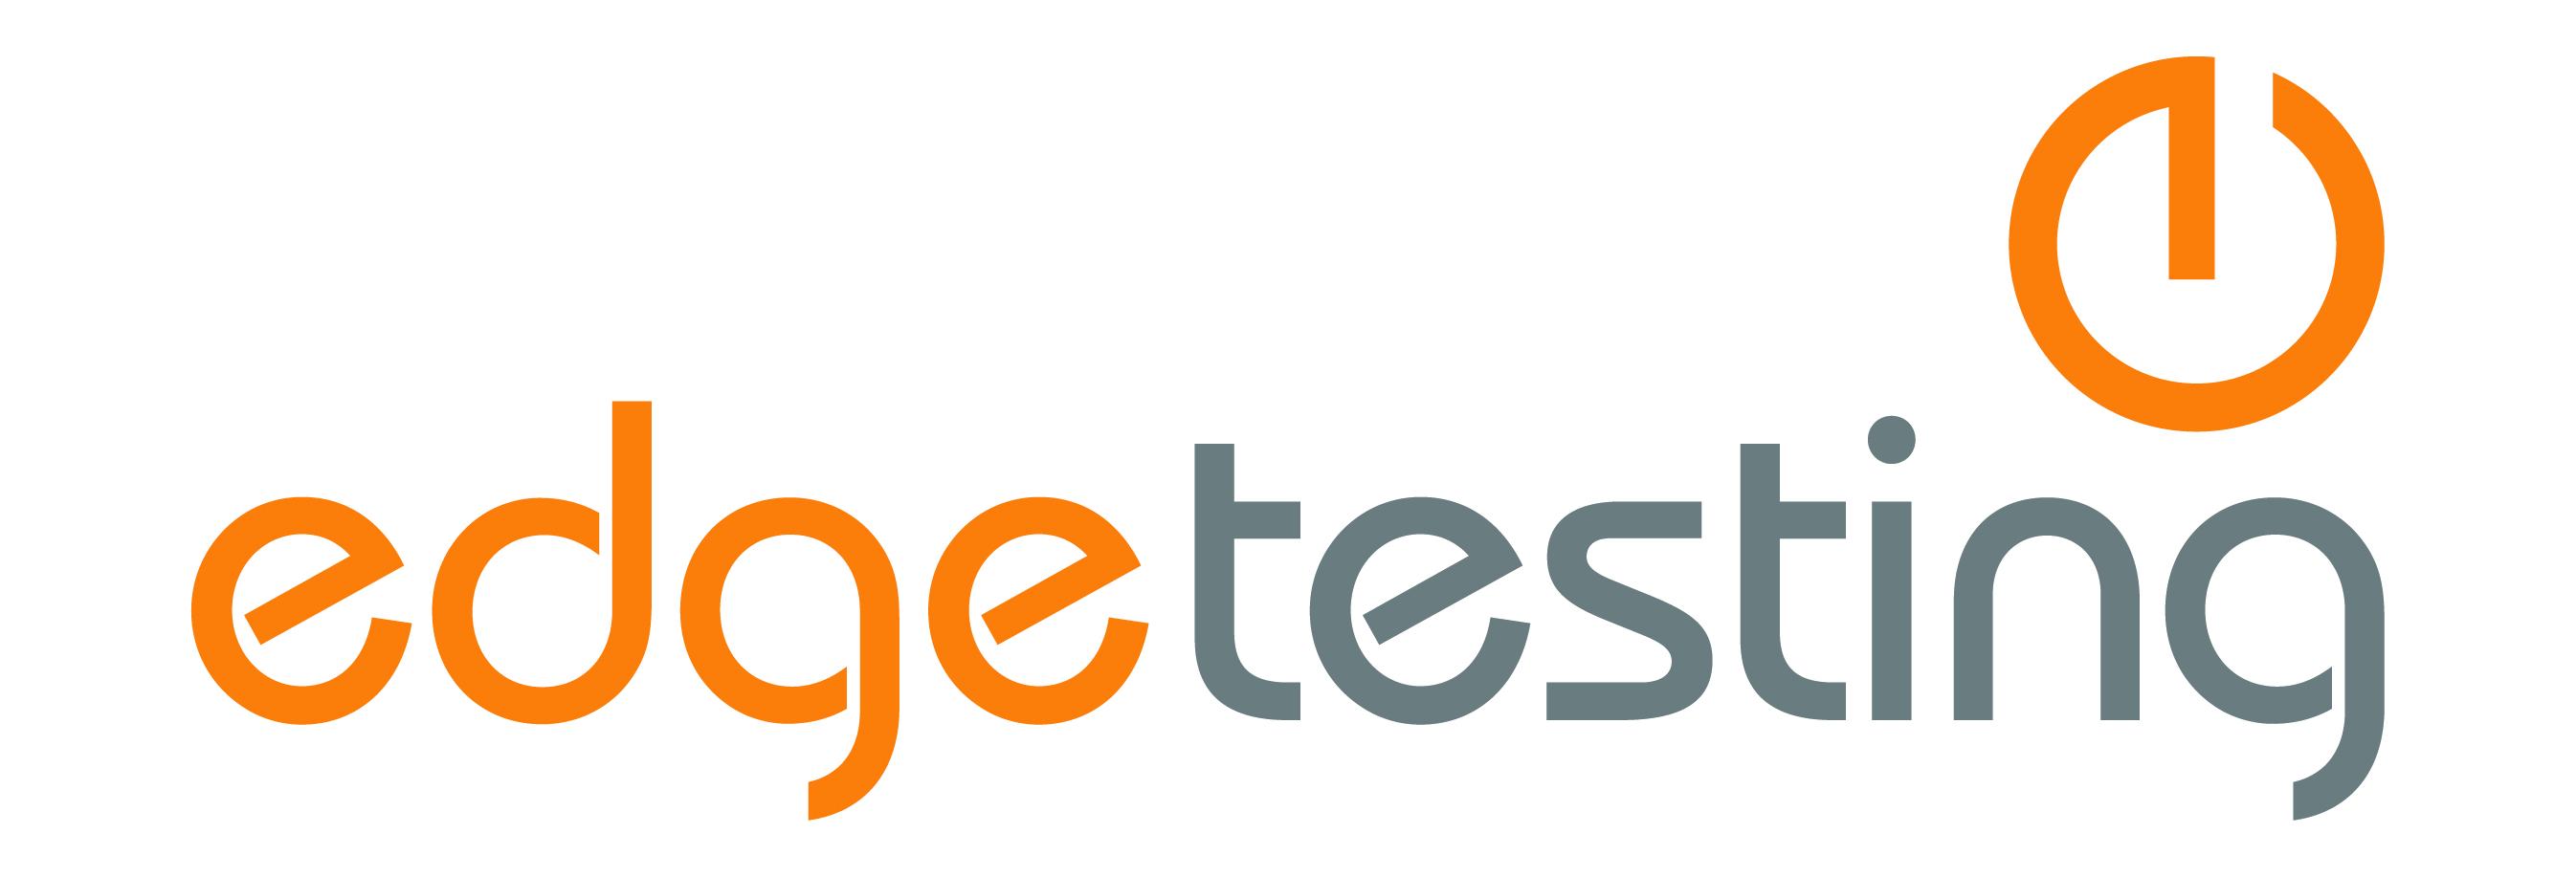 EdgeTesting Logo 300 dpi